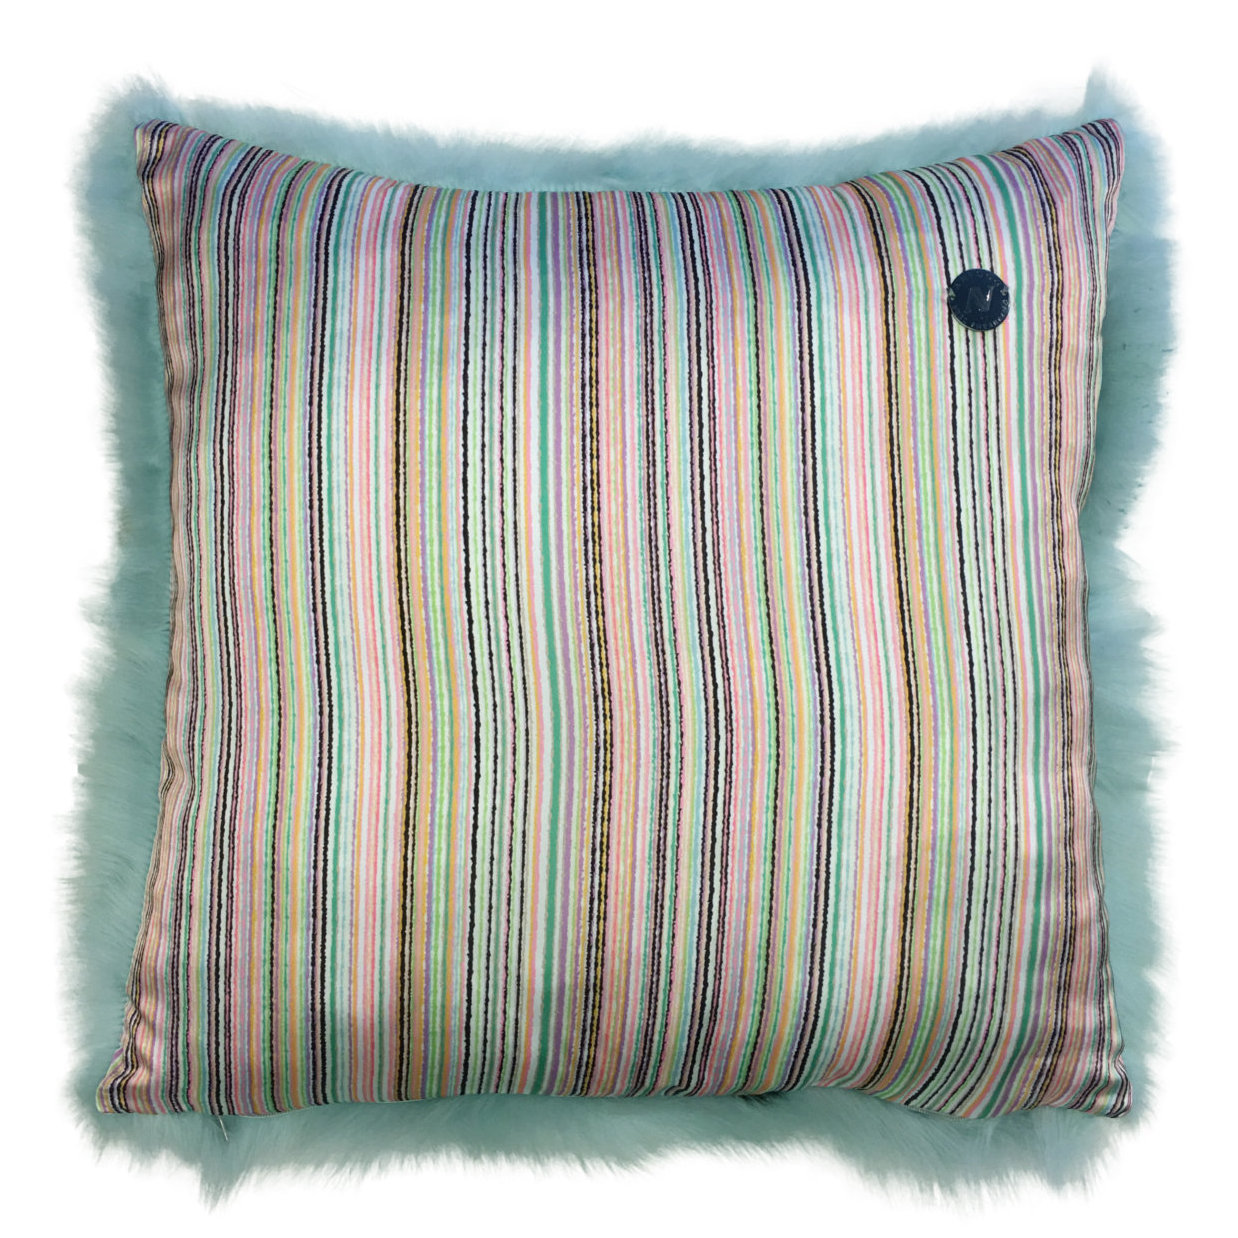 Shearling Pillow-Aqua-50x50cm_SPAQUS3145050-arka - ANVOGG FEEL SHEARLING | ANVOGG